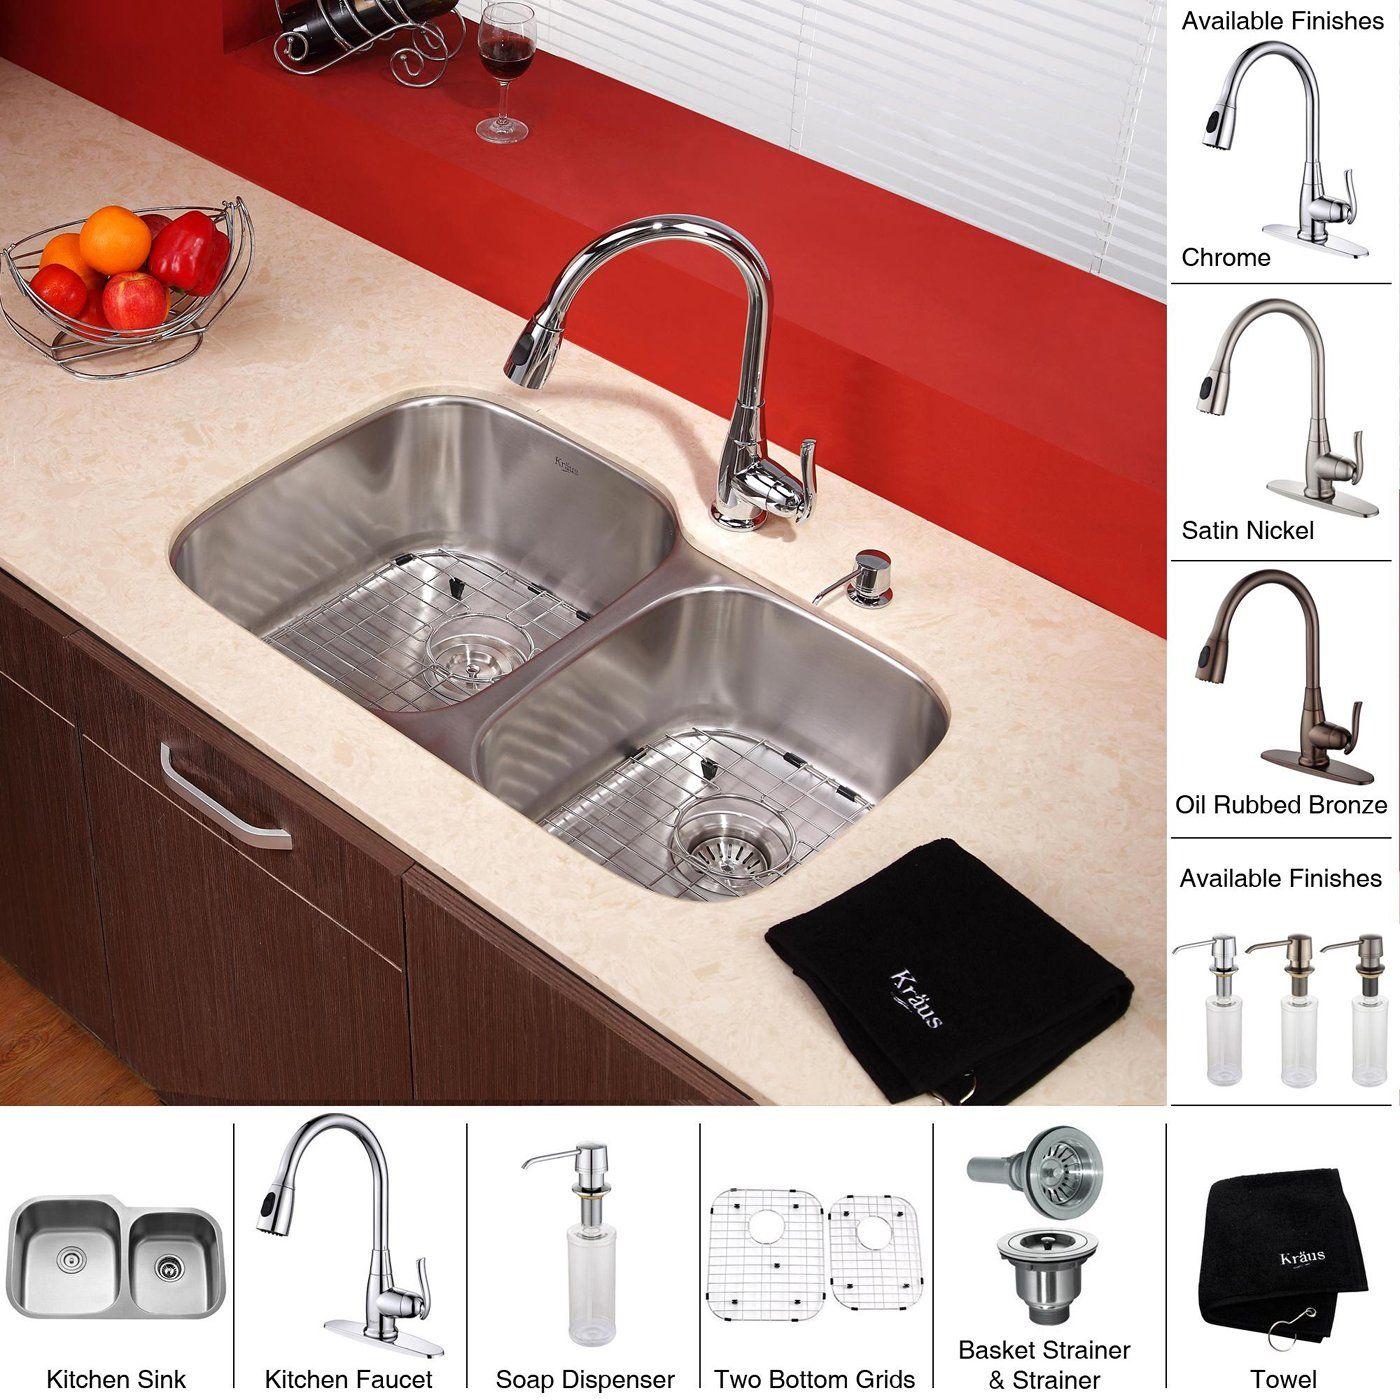 Kraus Kbu24 Kpf2230 Ksd30sn 32 In Undermount Double Bowl Stainless Steel Kitchen Sink With Chrome Kitch Sink Stainless Steel Kitchen Sink Chrome Kitchen Faucet